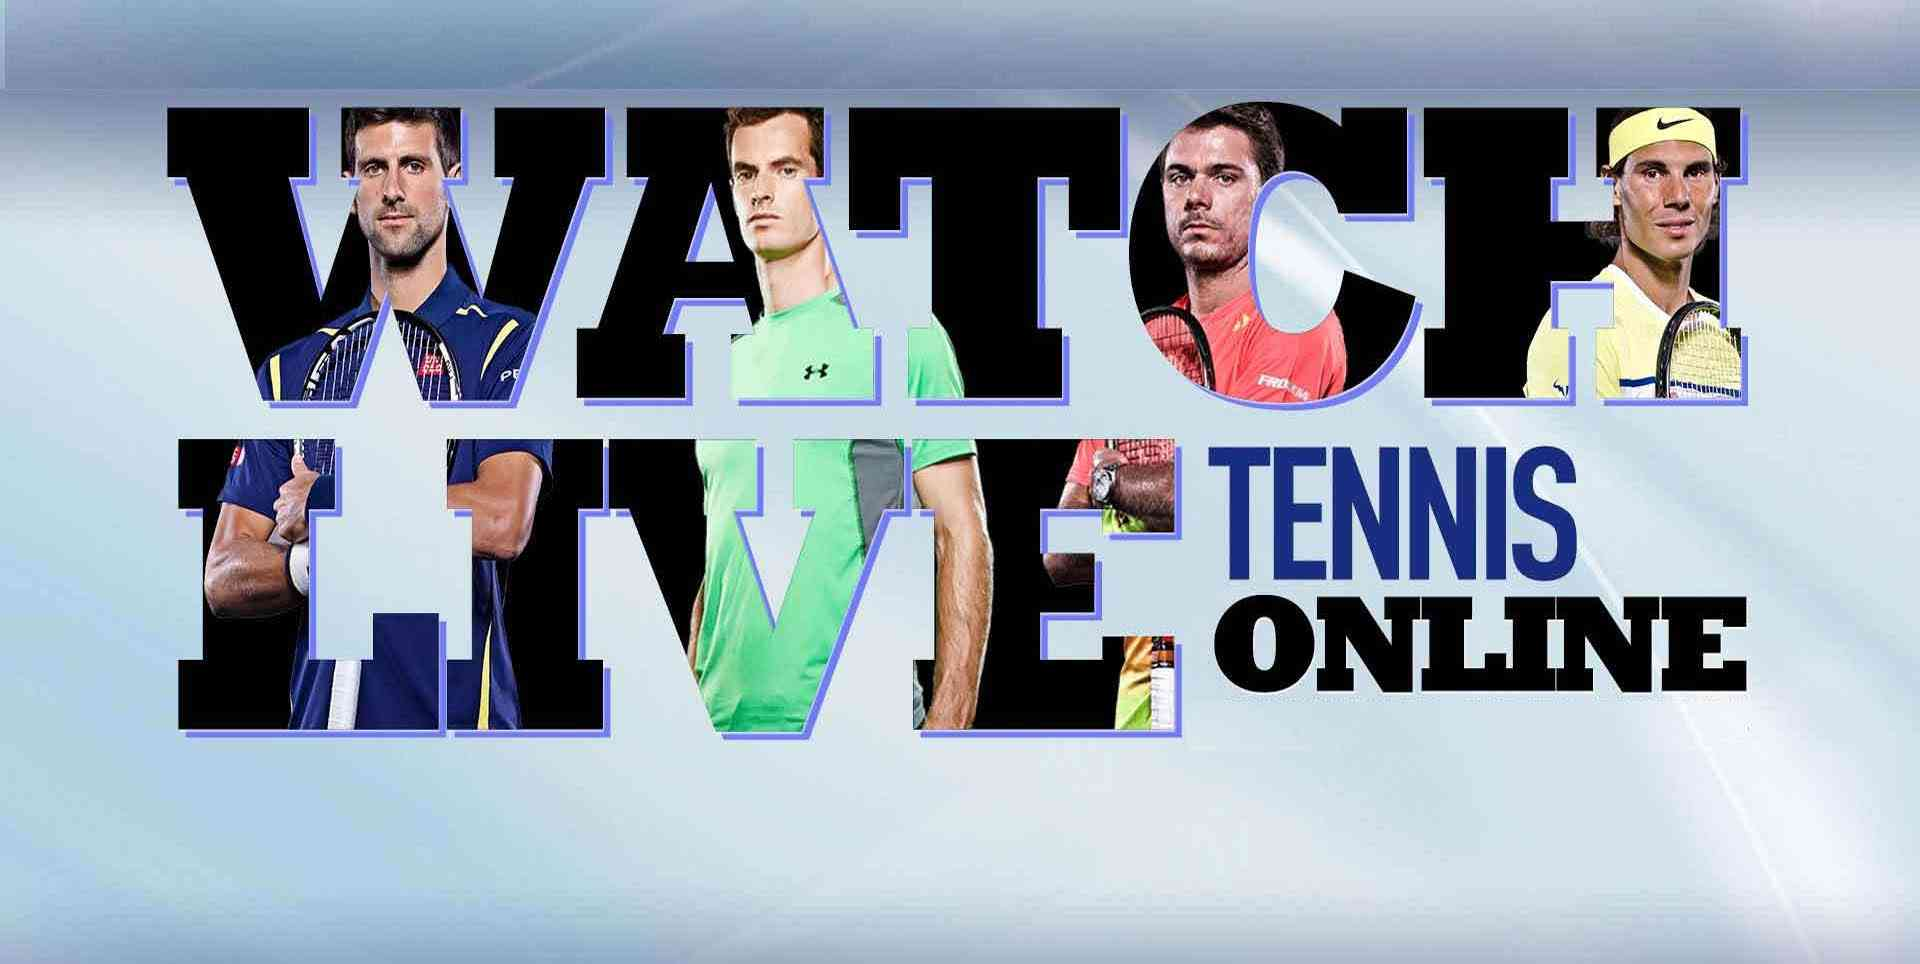 watch-e.-makarova-vs-m.-niculescu-quarterfinals-online-2013